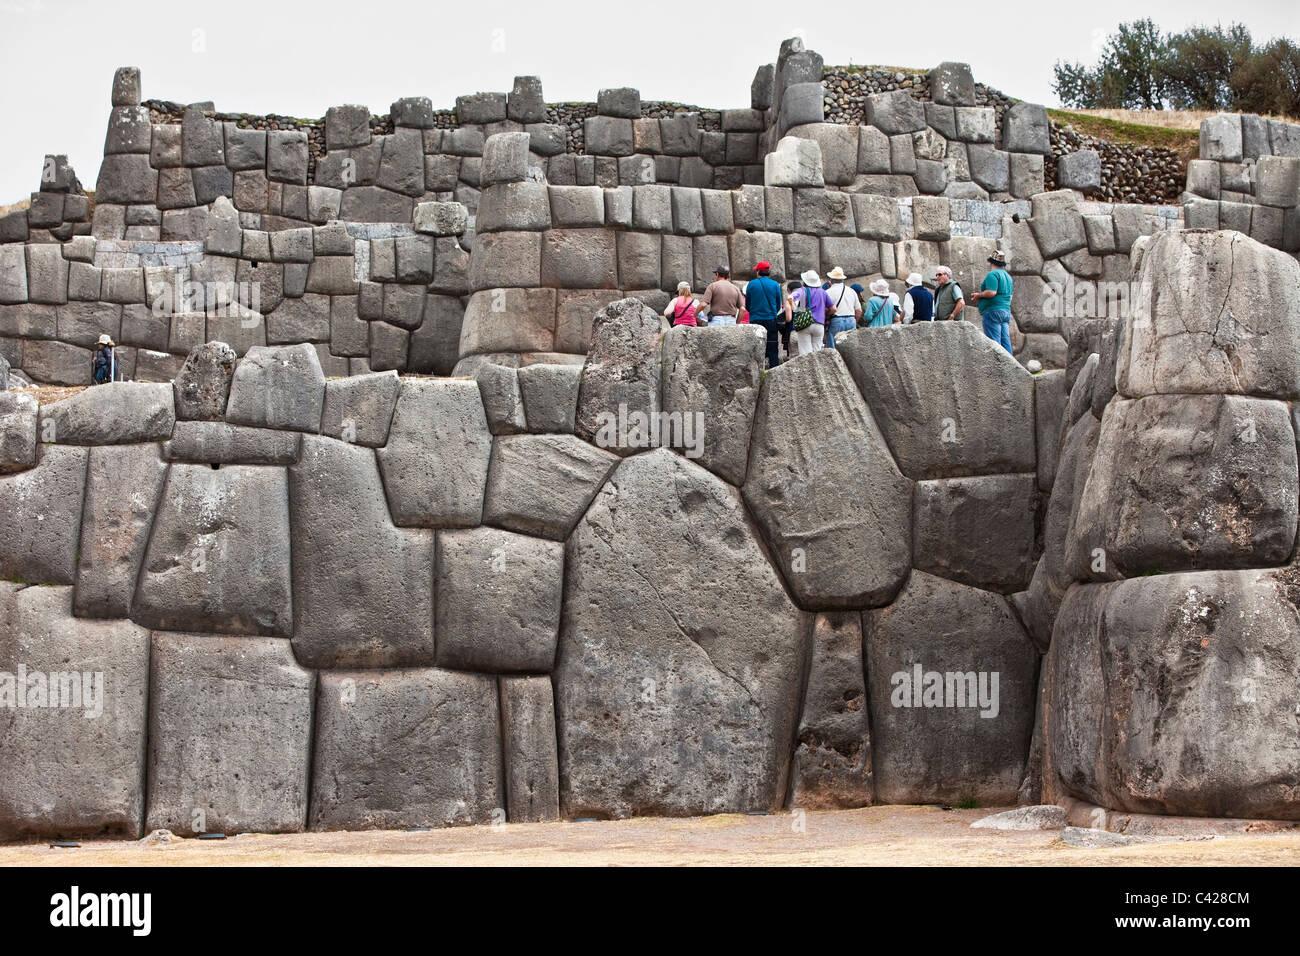 Peru, Cusco, Cuzco, Saqsayhuaman, Sacsayhuaman, Sacsaywaman. Inca Ruins. Group of tourists. UNESCO World Heritage - Stock Image